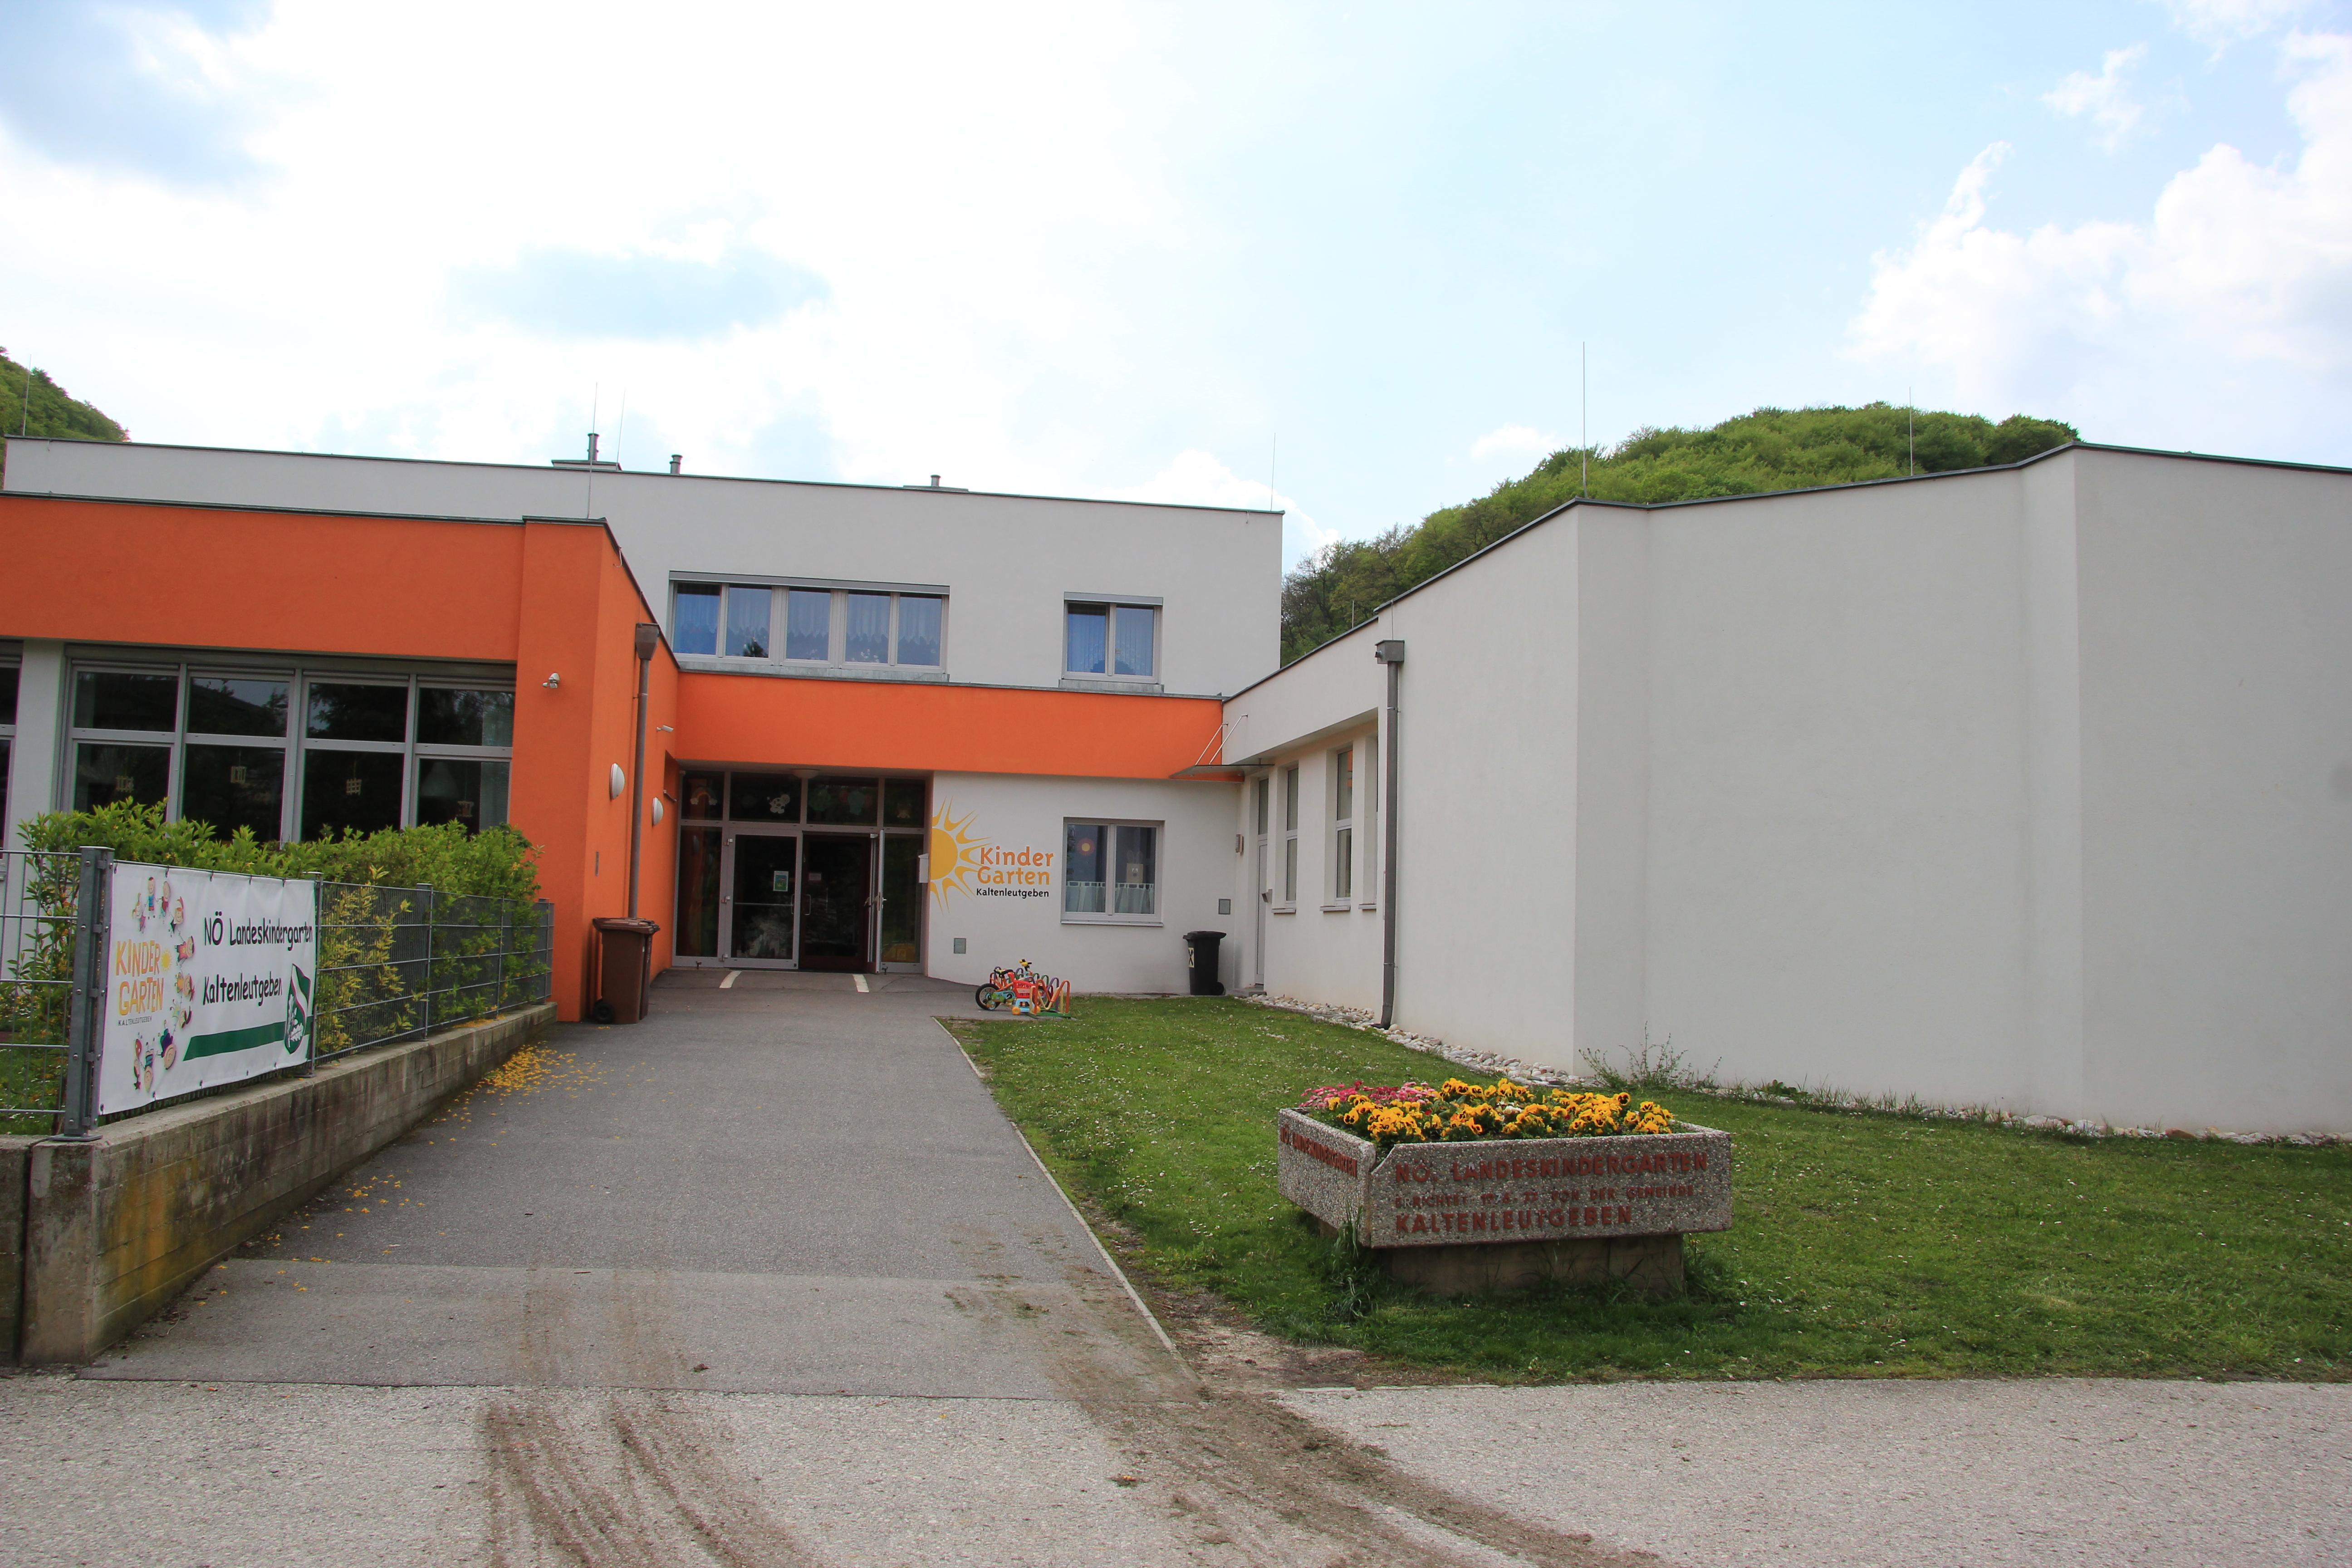 GRNE Kaltenleutgeben - Home | Facebook